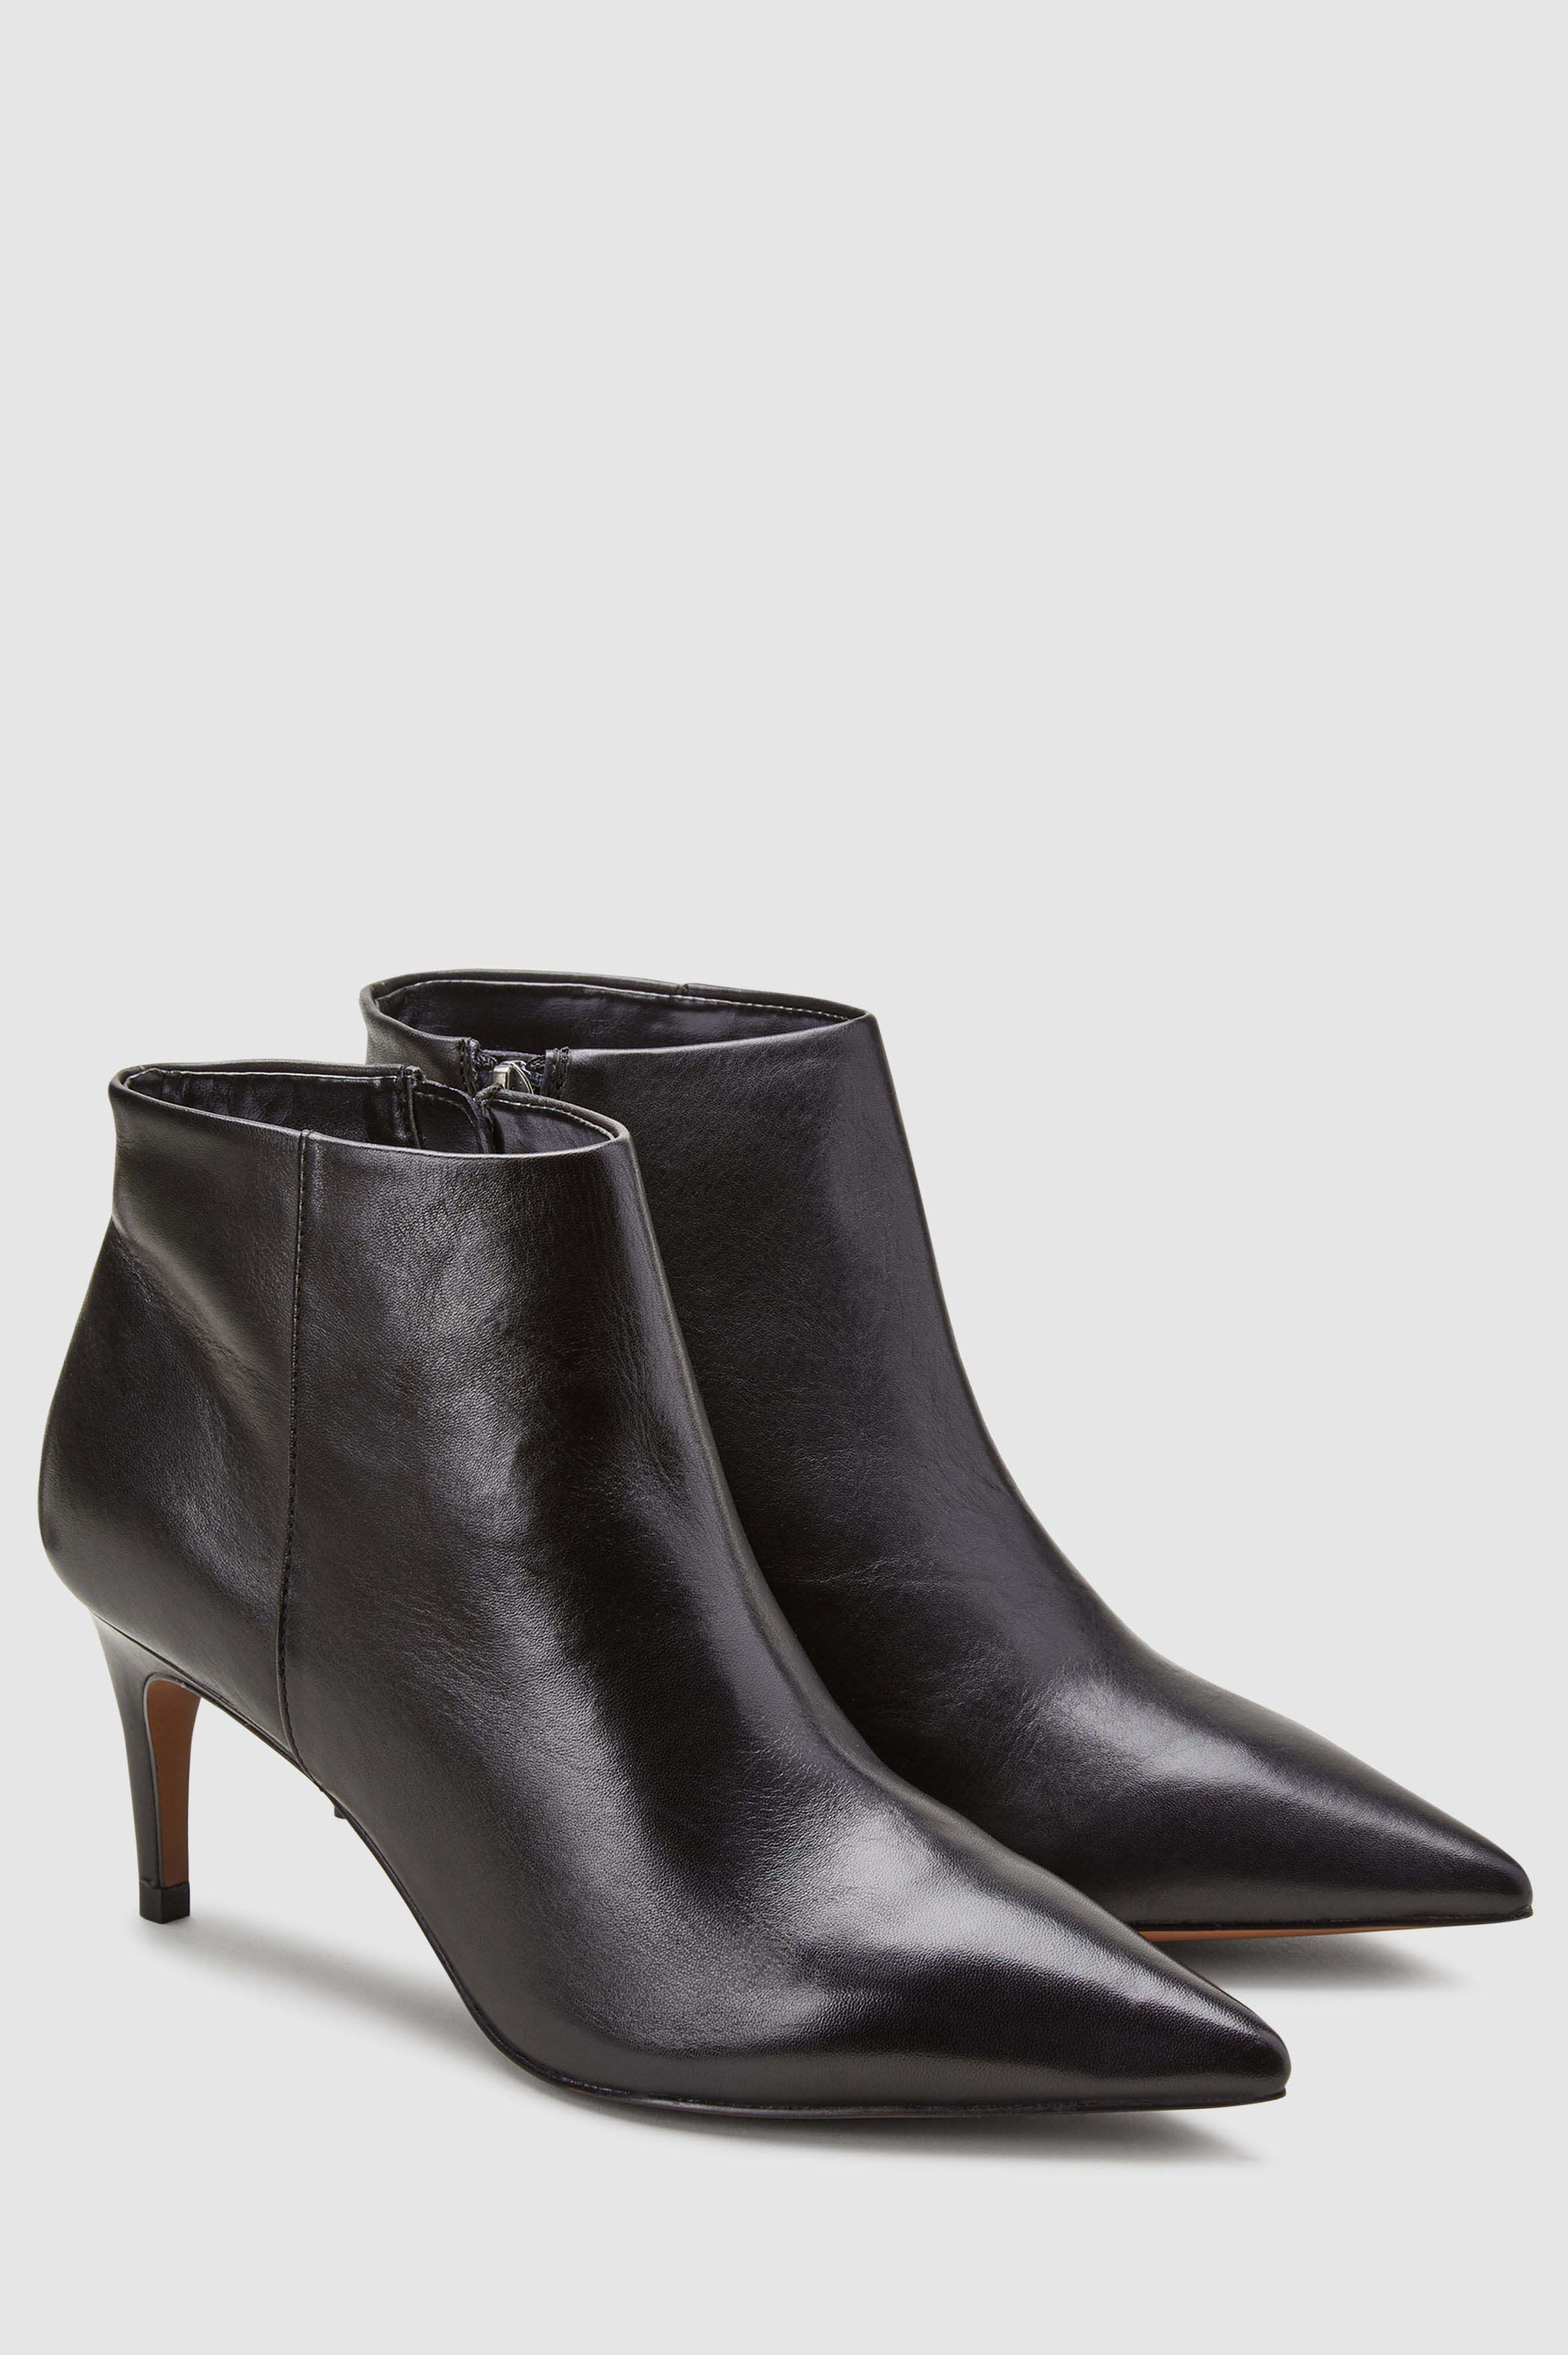 8619e9e3f7e Womens Next Neutral Forever Comfort Leather Shoe Boots - Nude ...